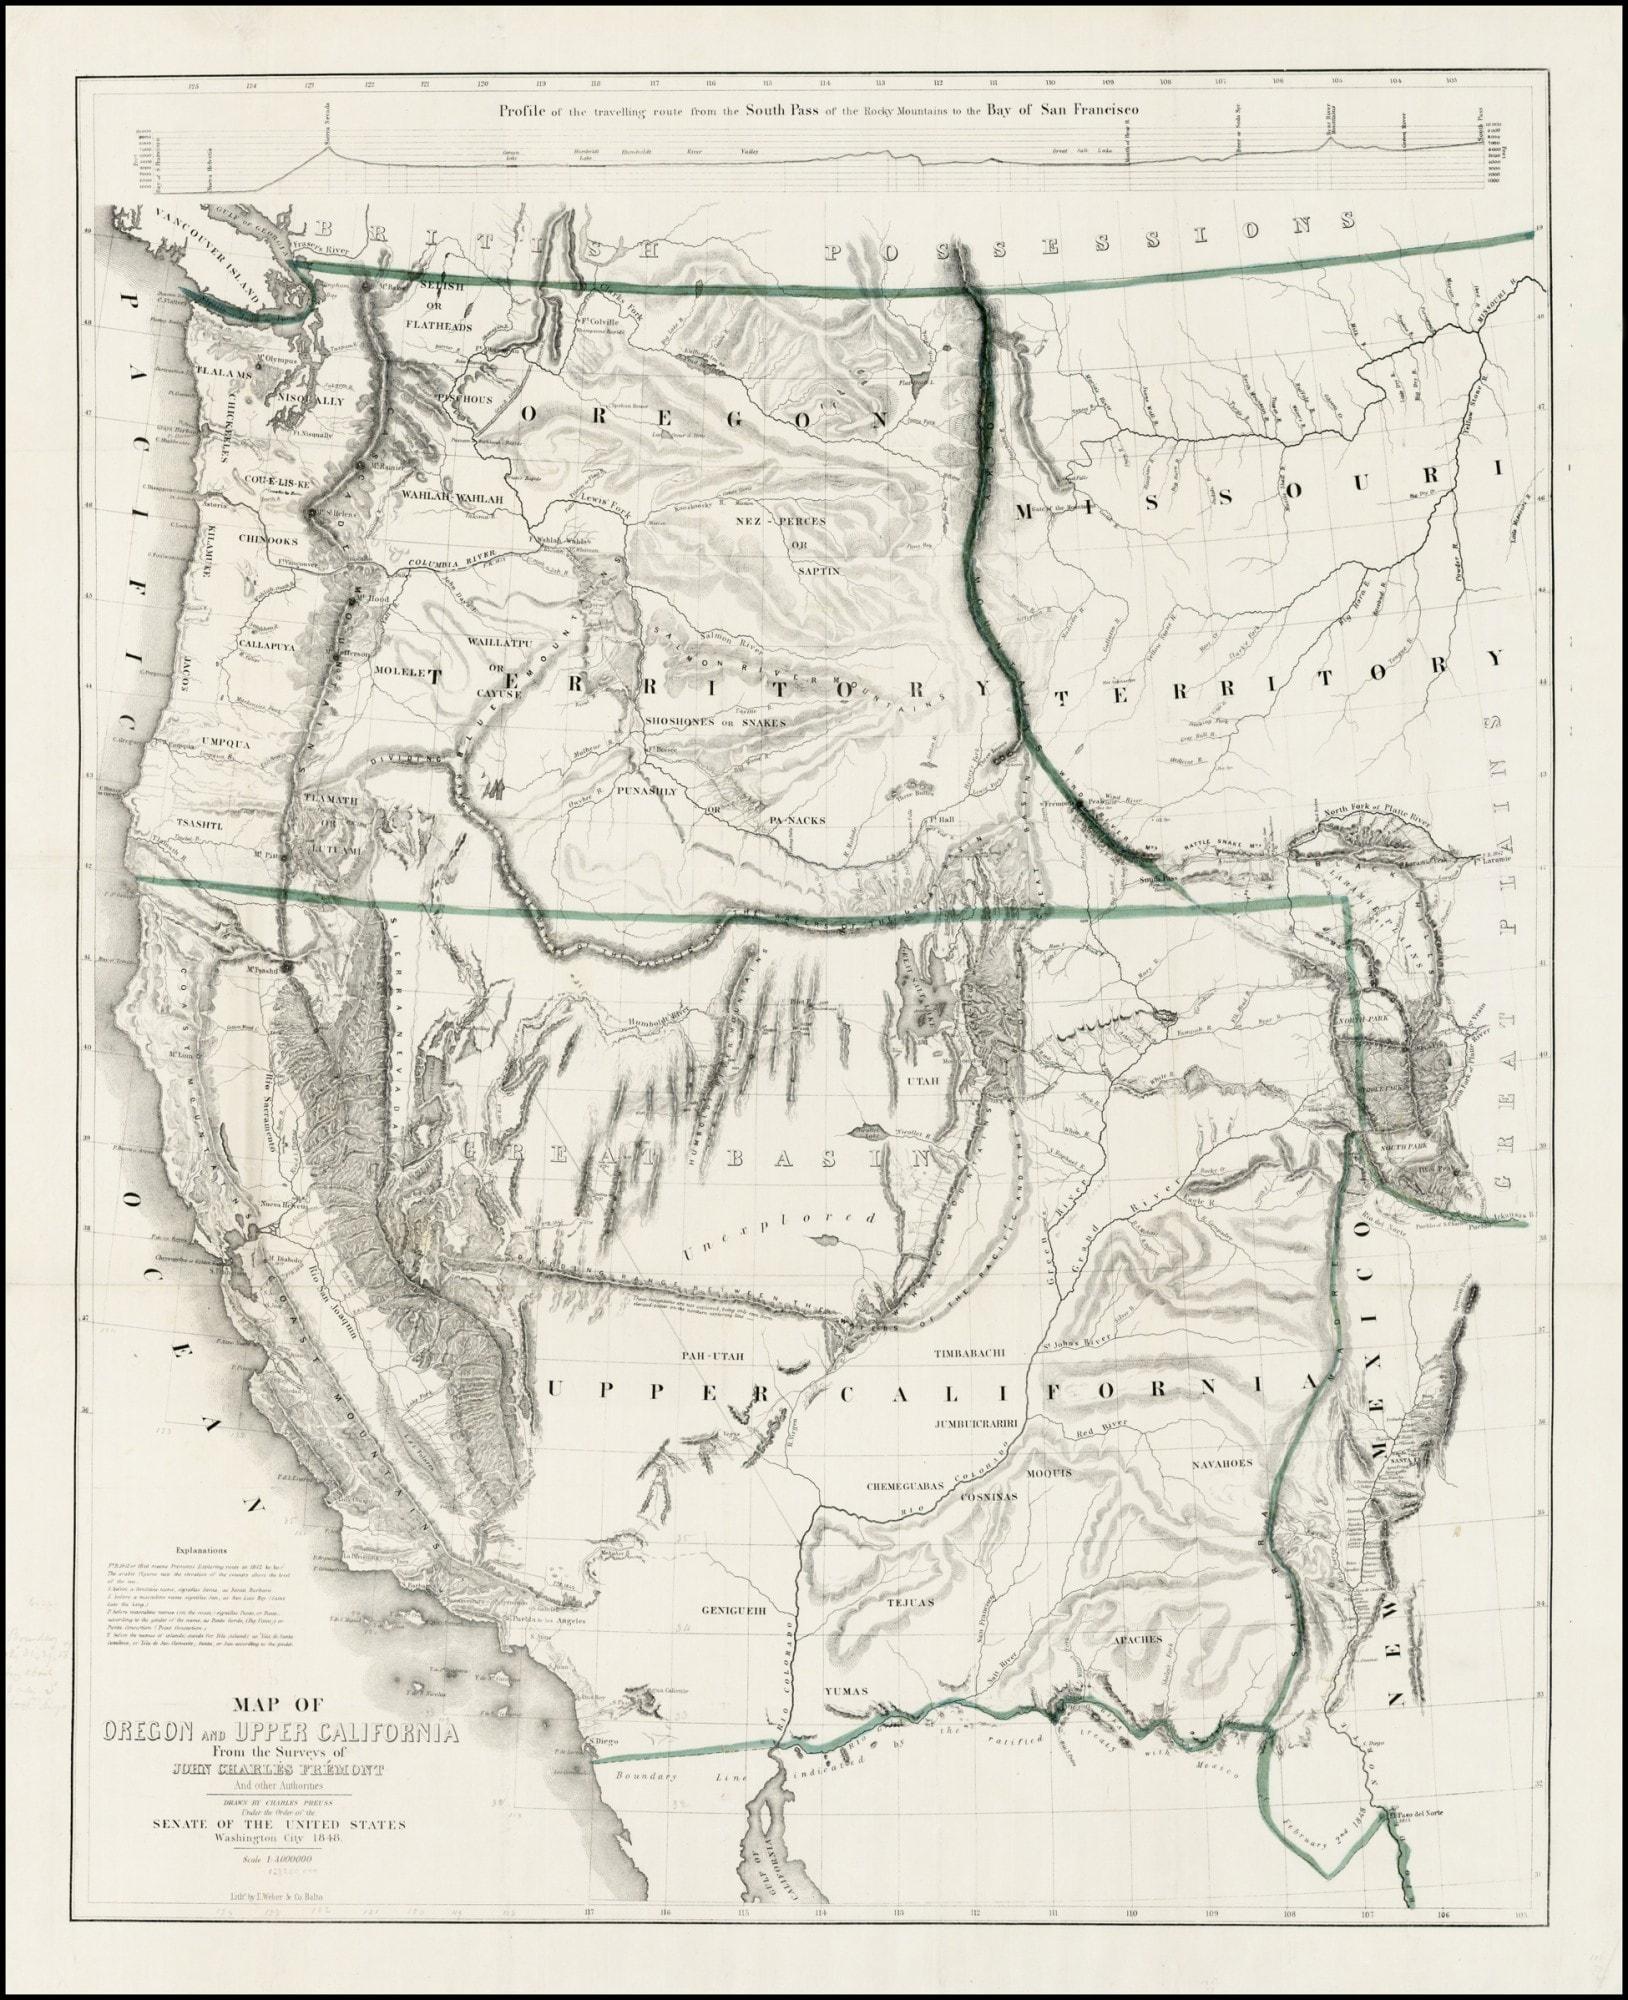 A Classic California Gold Rush Map - Rare & Antique Maps - California Gold Rush Map